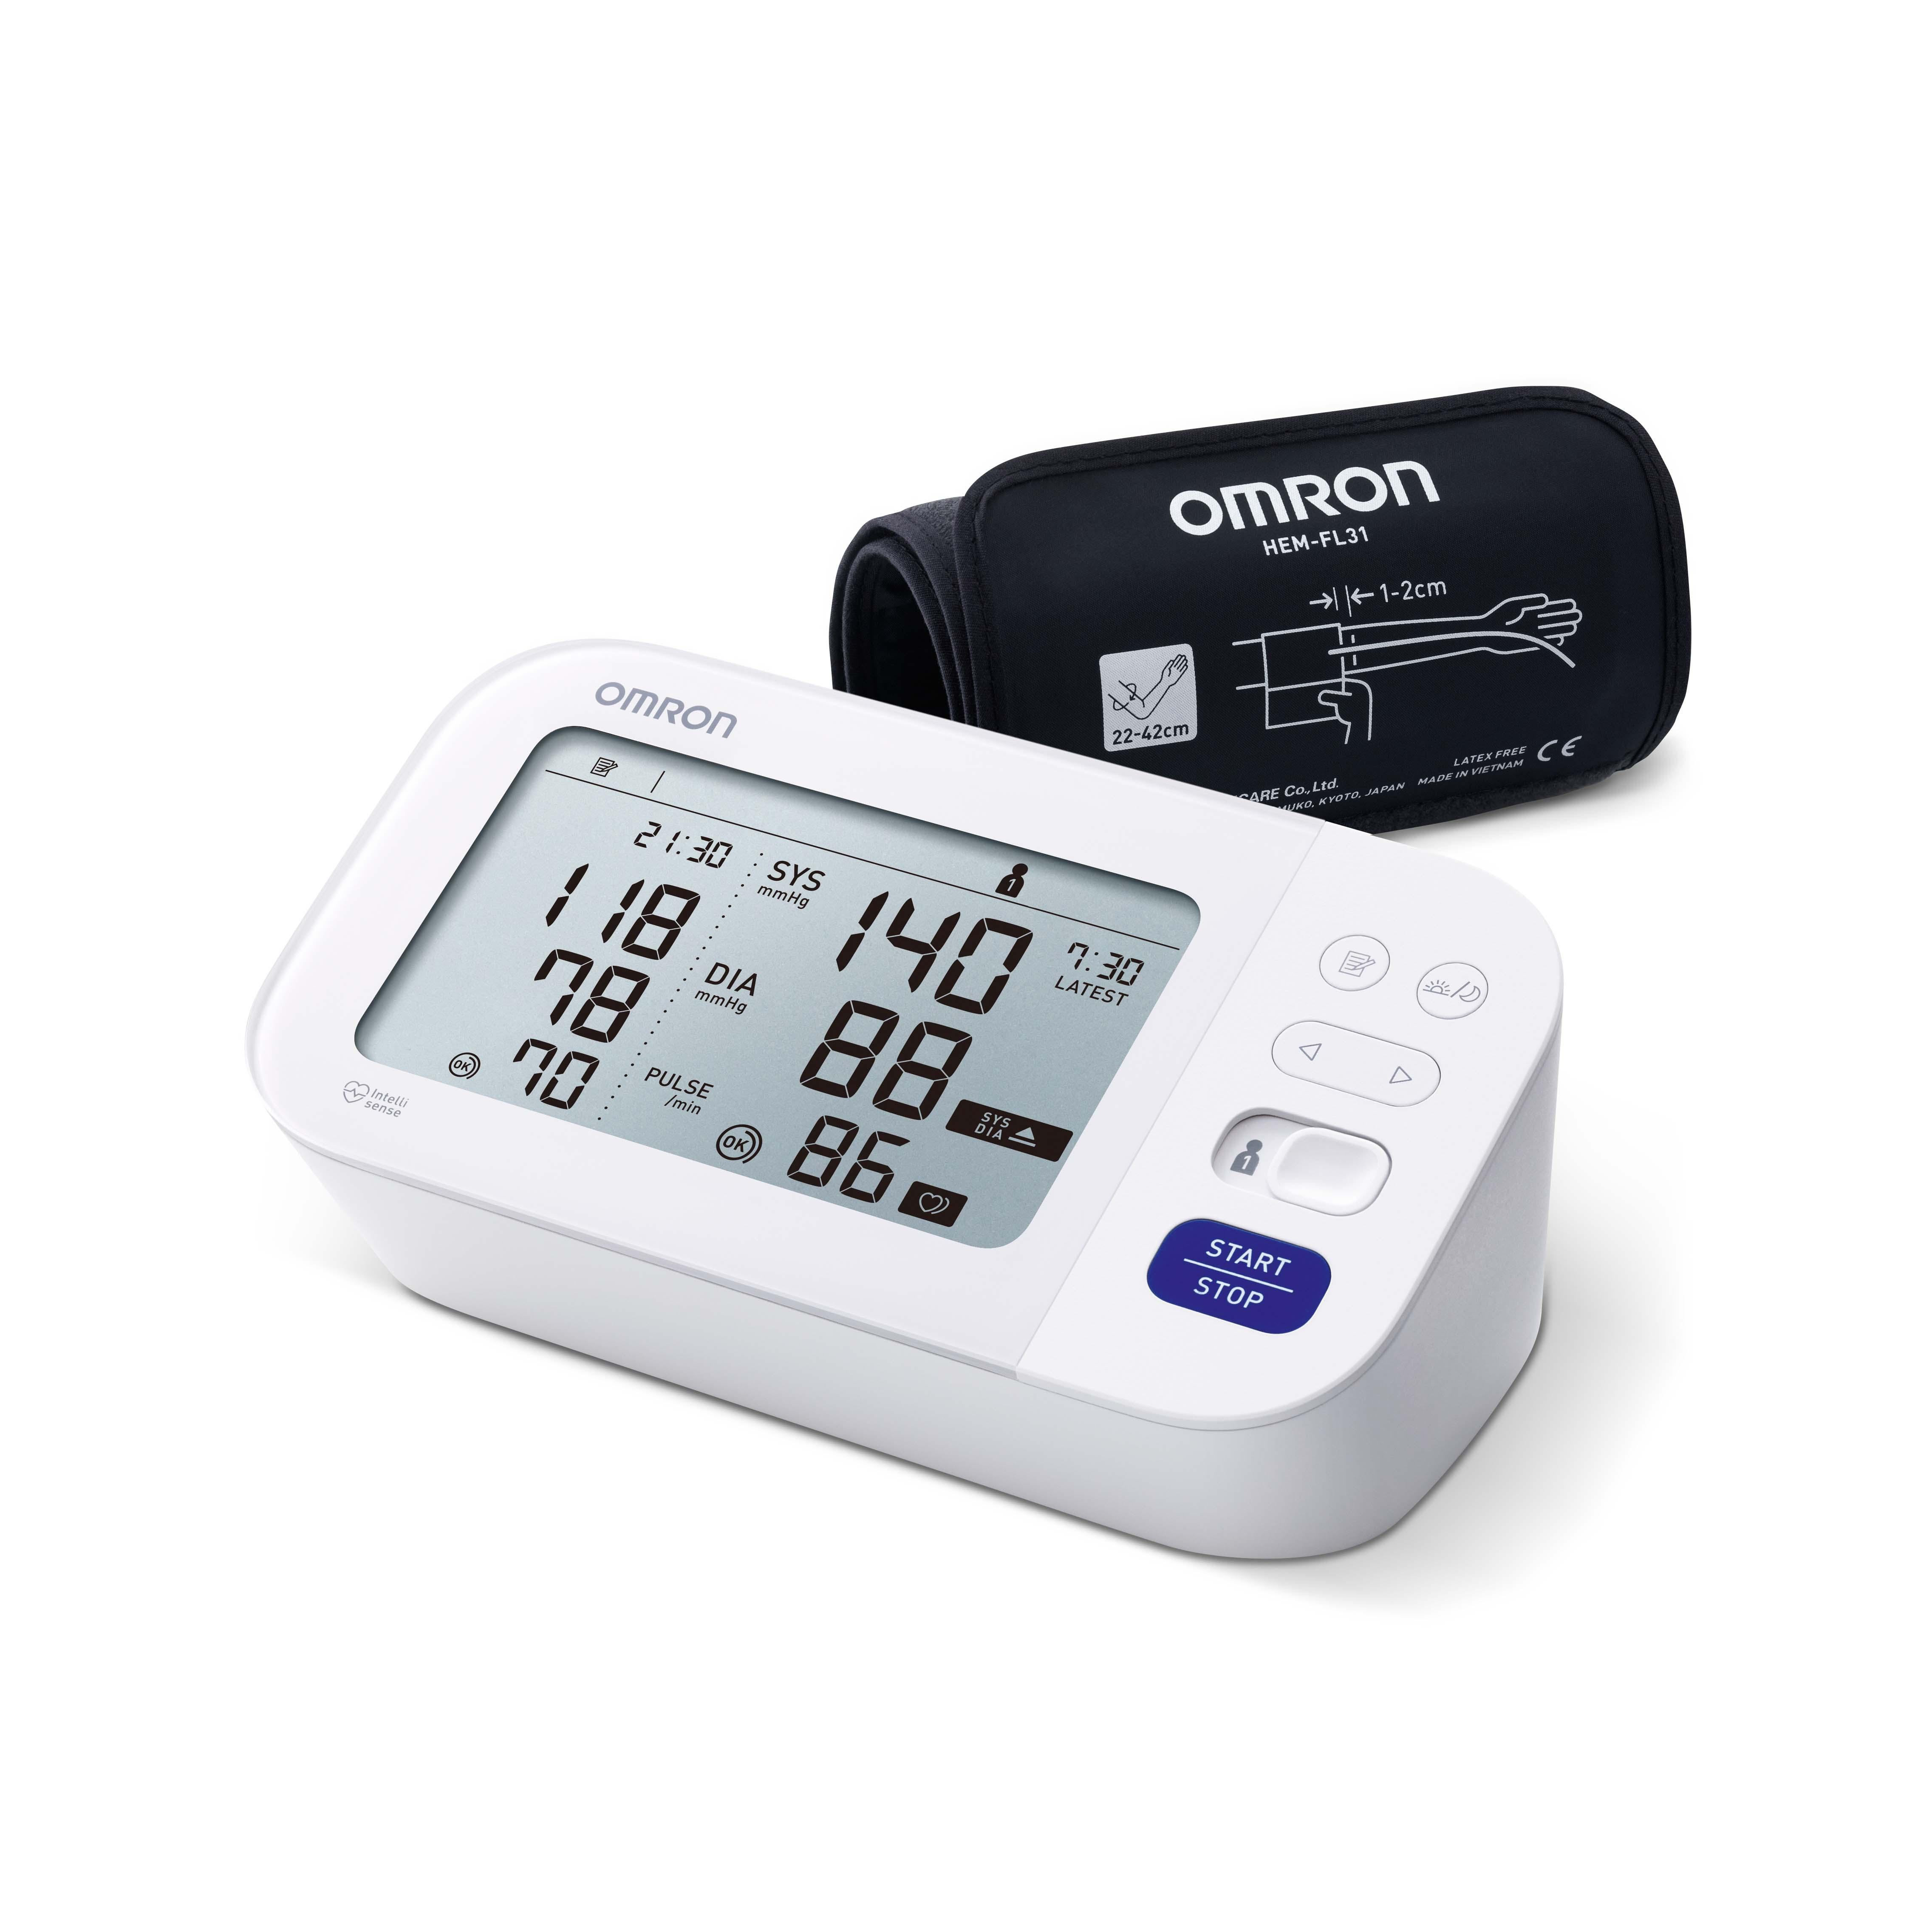 Omron tensiomètre M6 Comfort - automatique - blanc